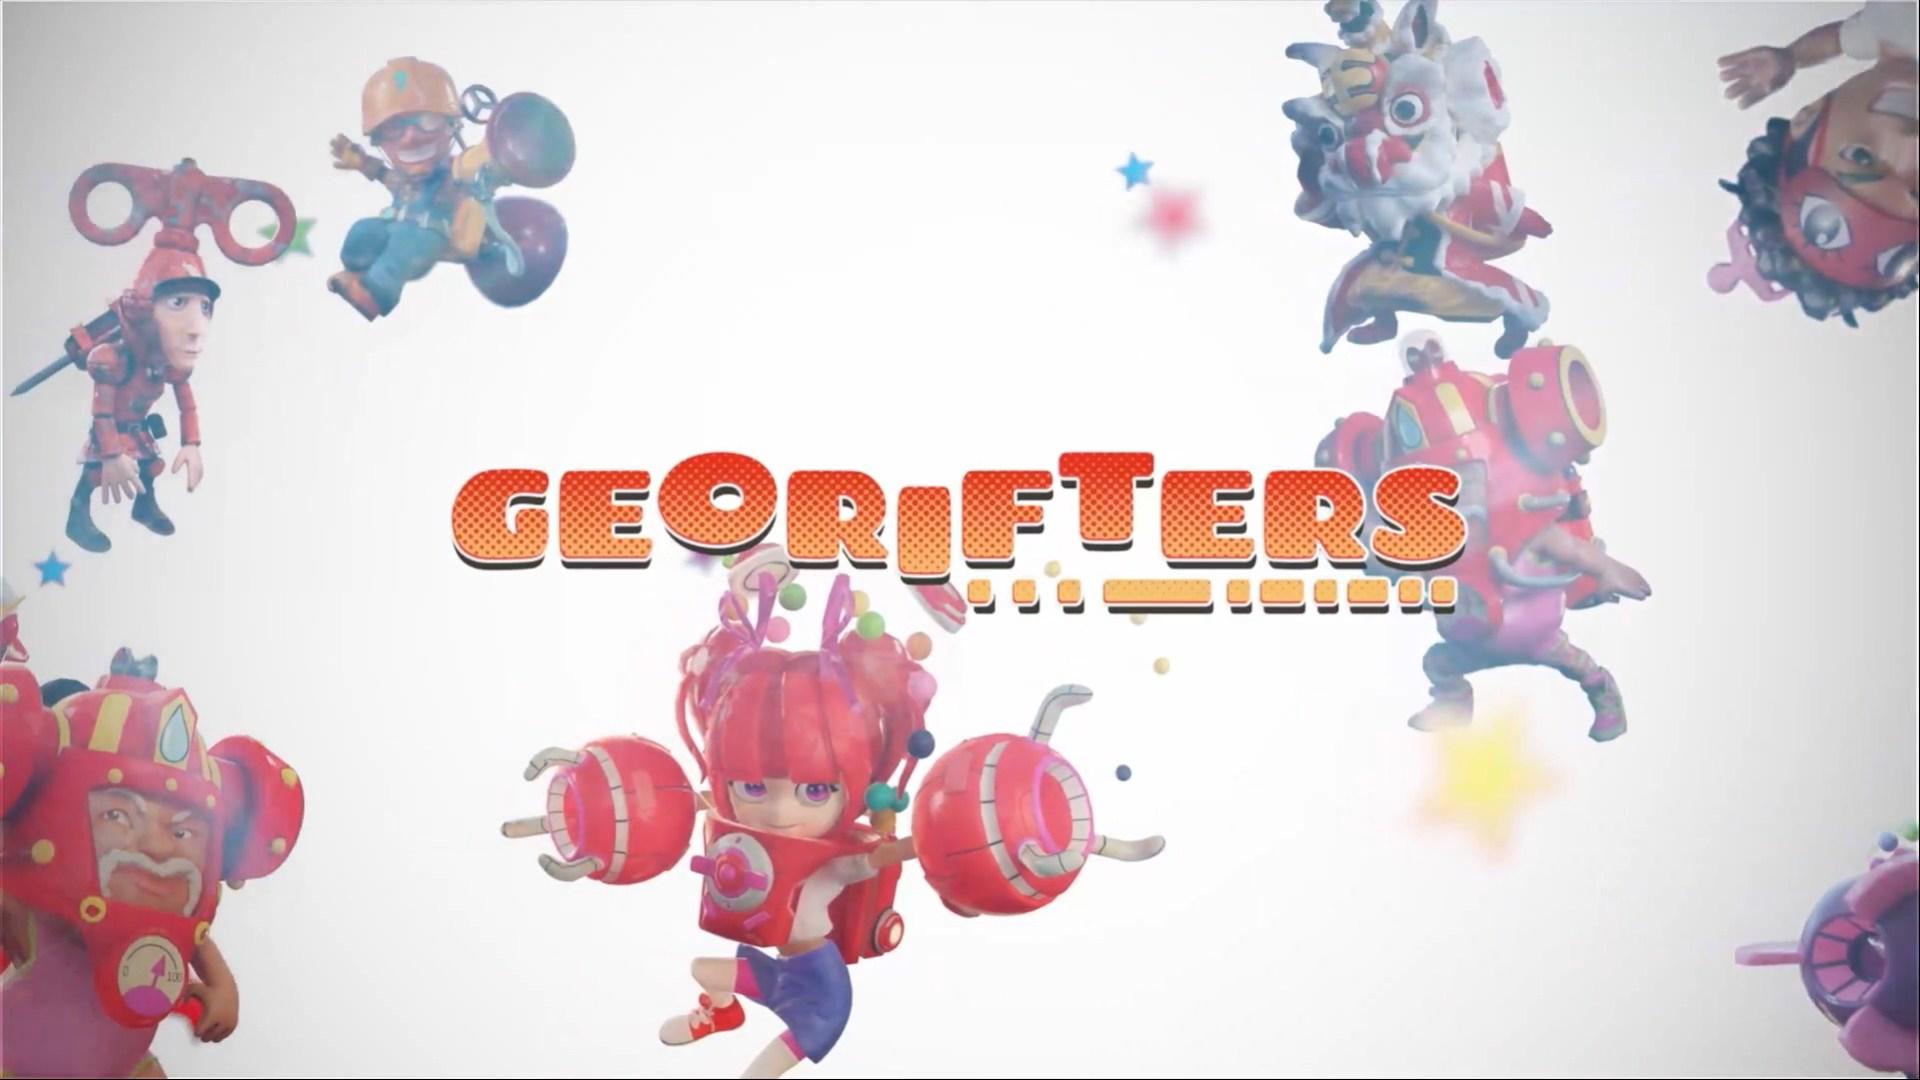 georifters video game wallpaper 73508